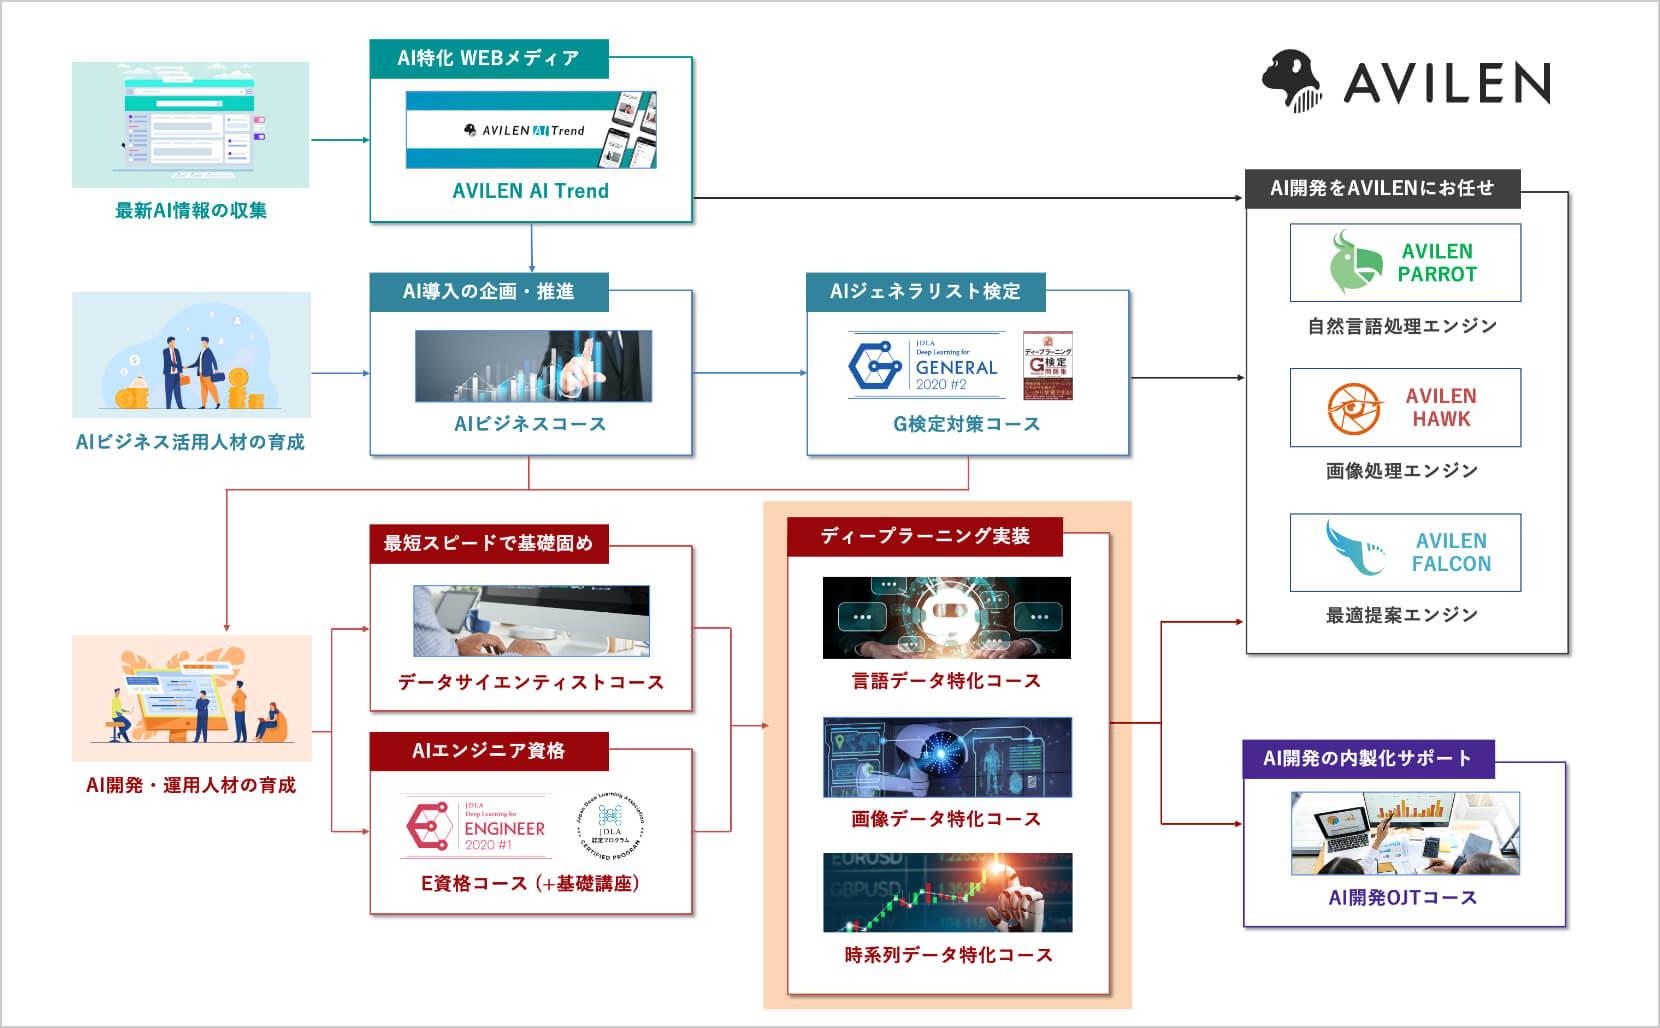 AVILEN AIサービスロードマップ